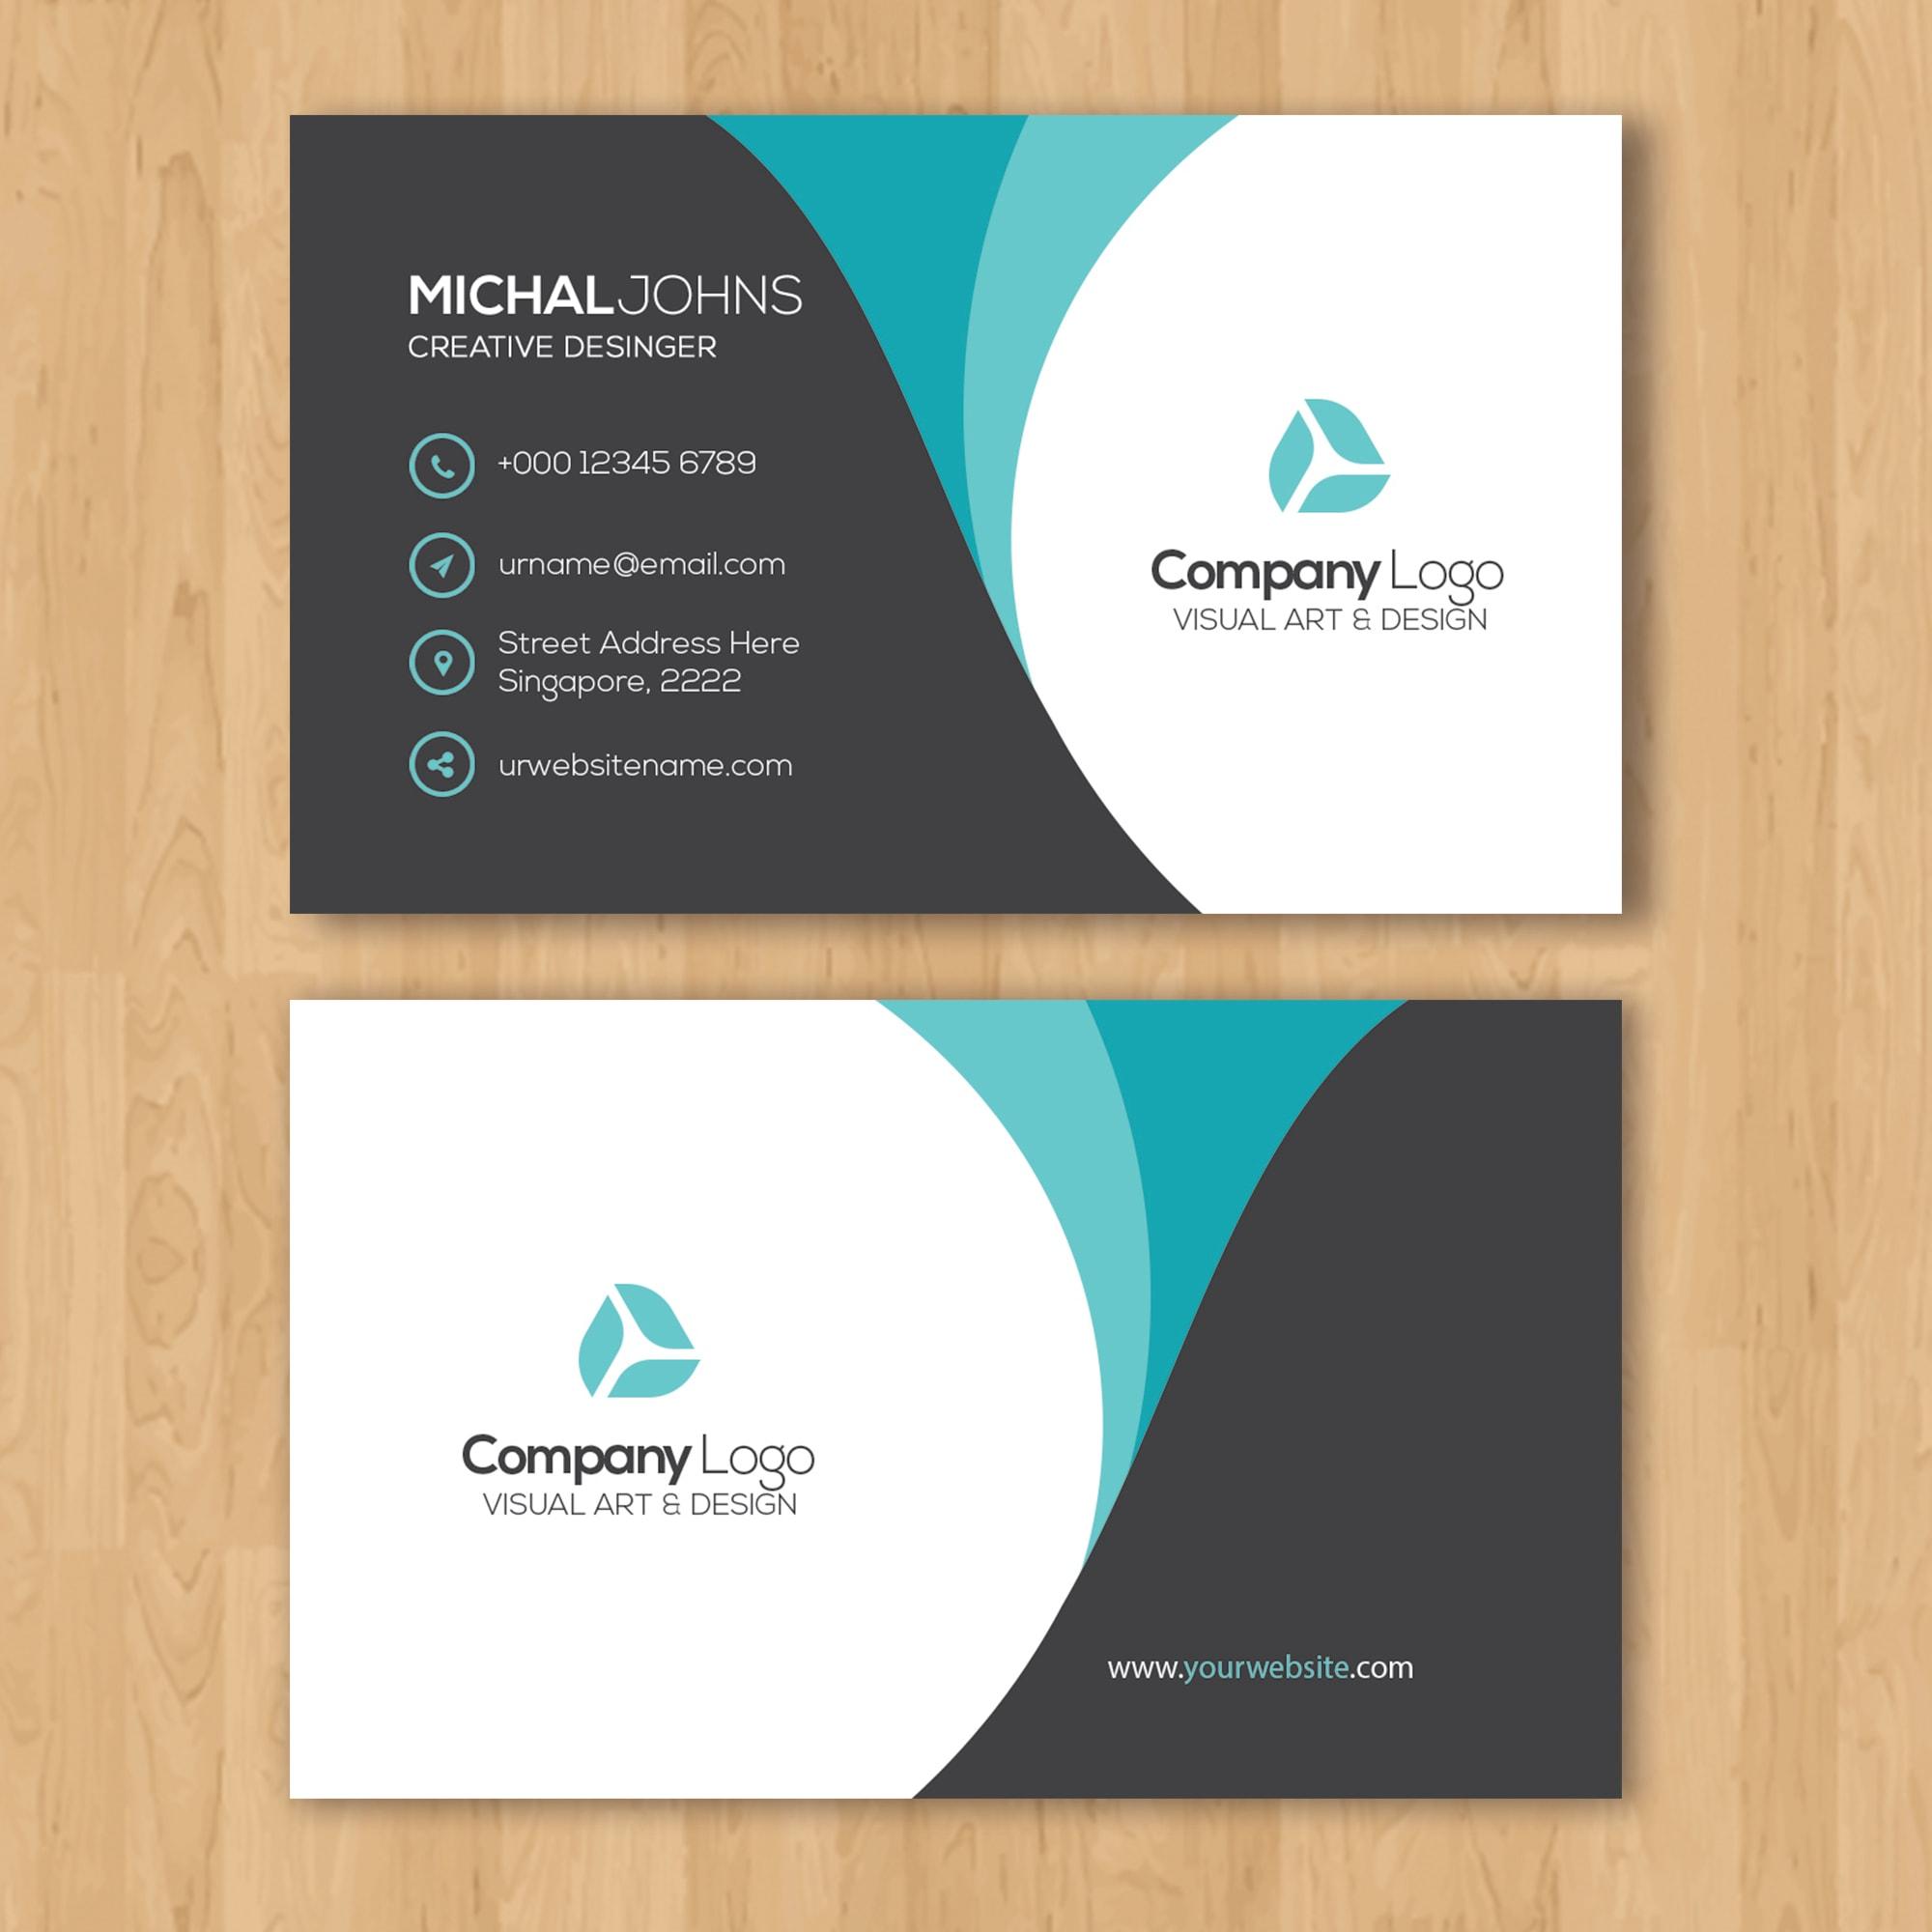 Design Eye Catching Visiting Cardsbrochuresletterheads By Swastipujari